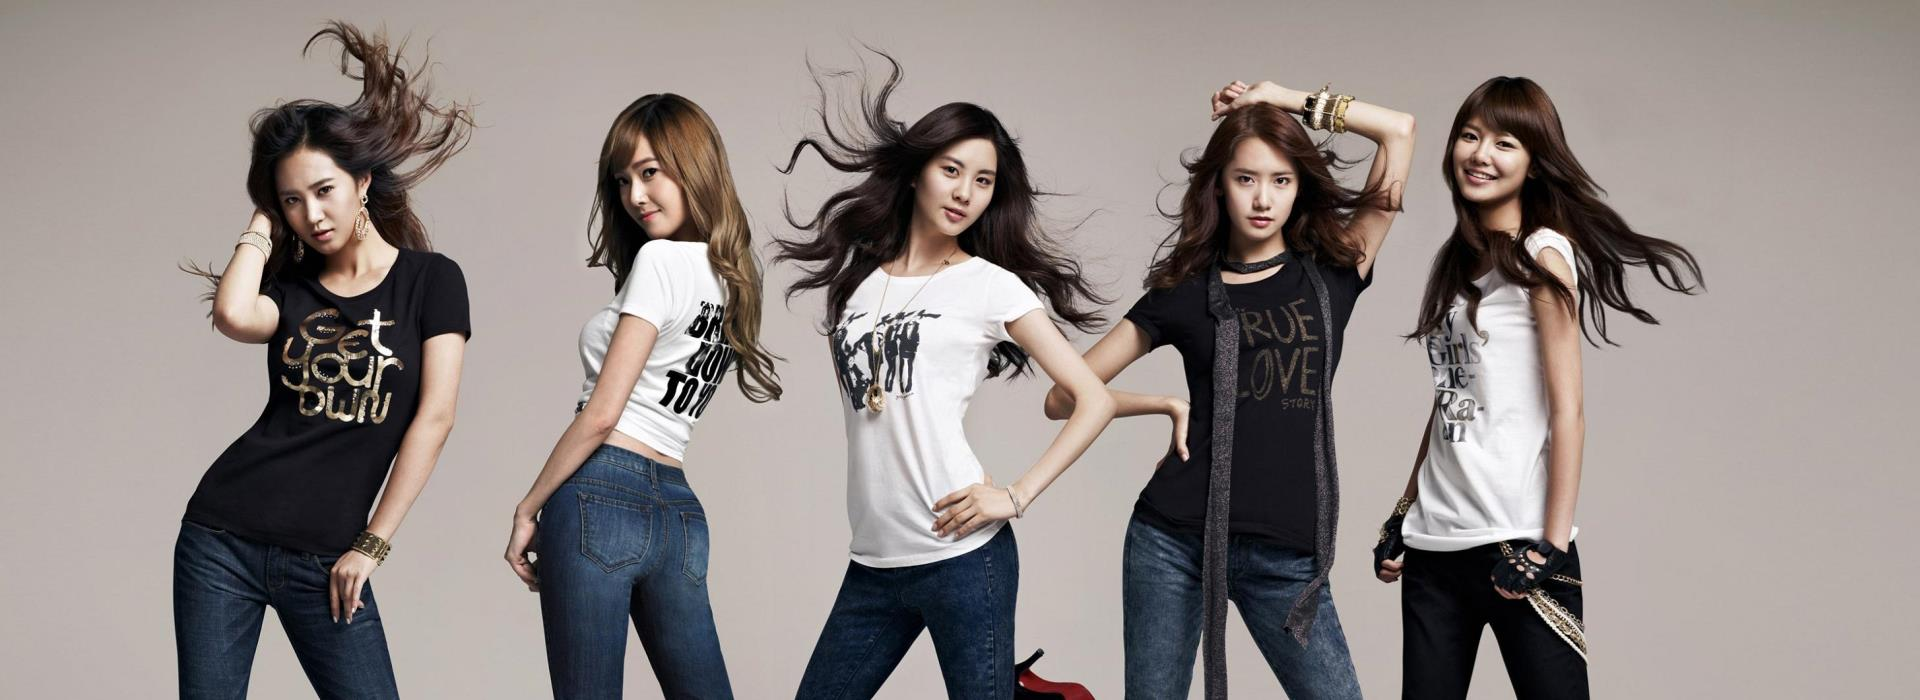 Cours de danse K-pop